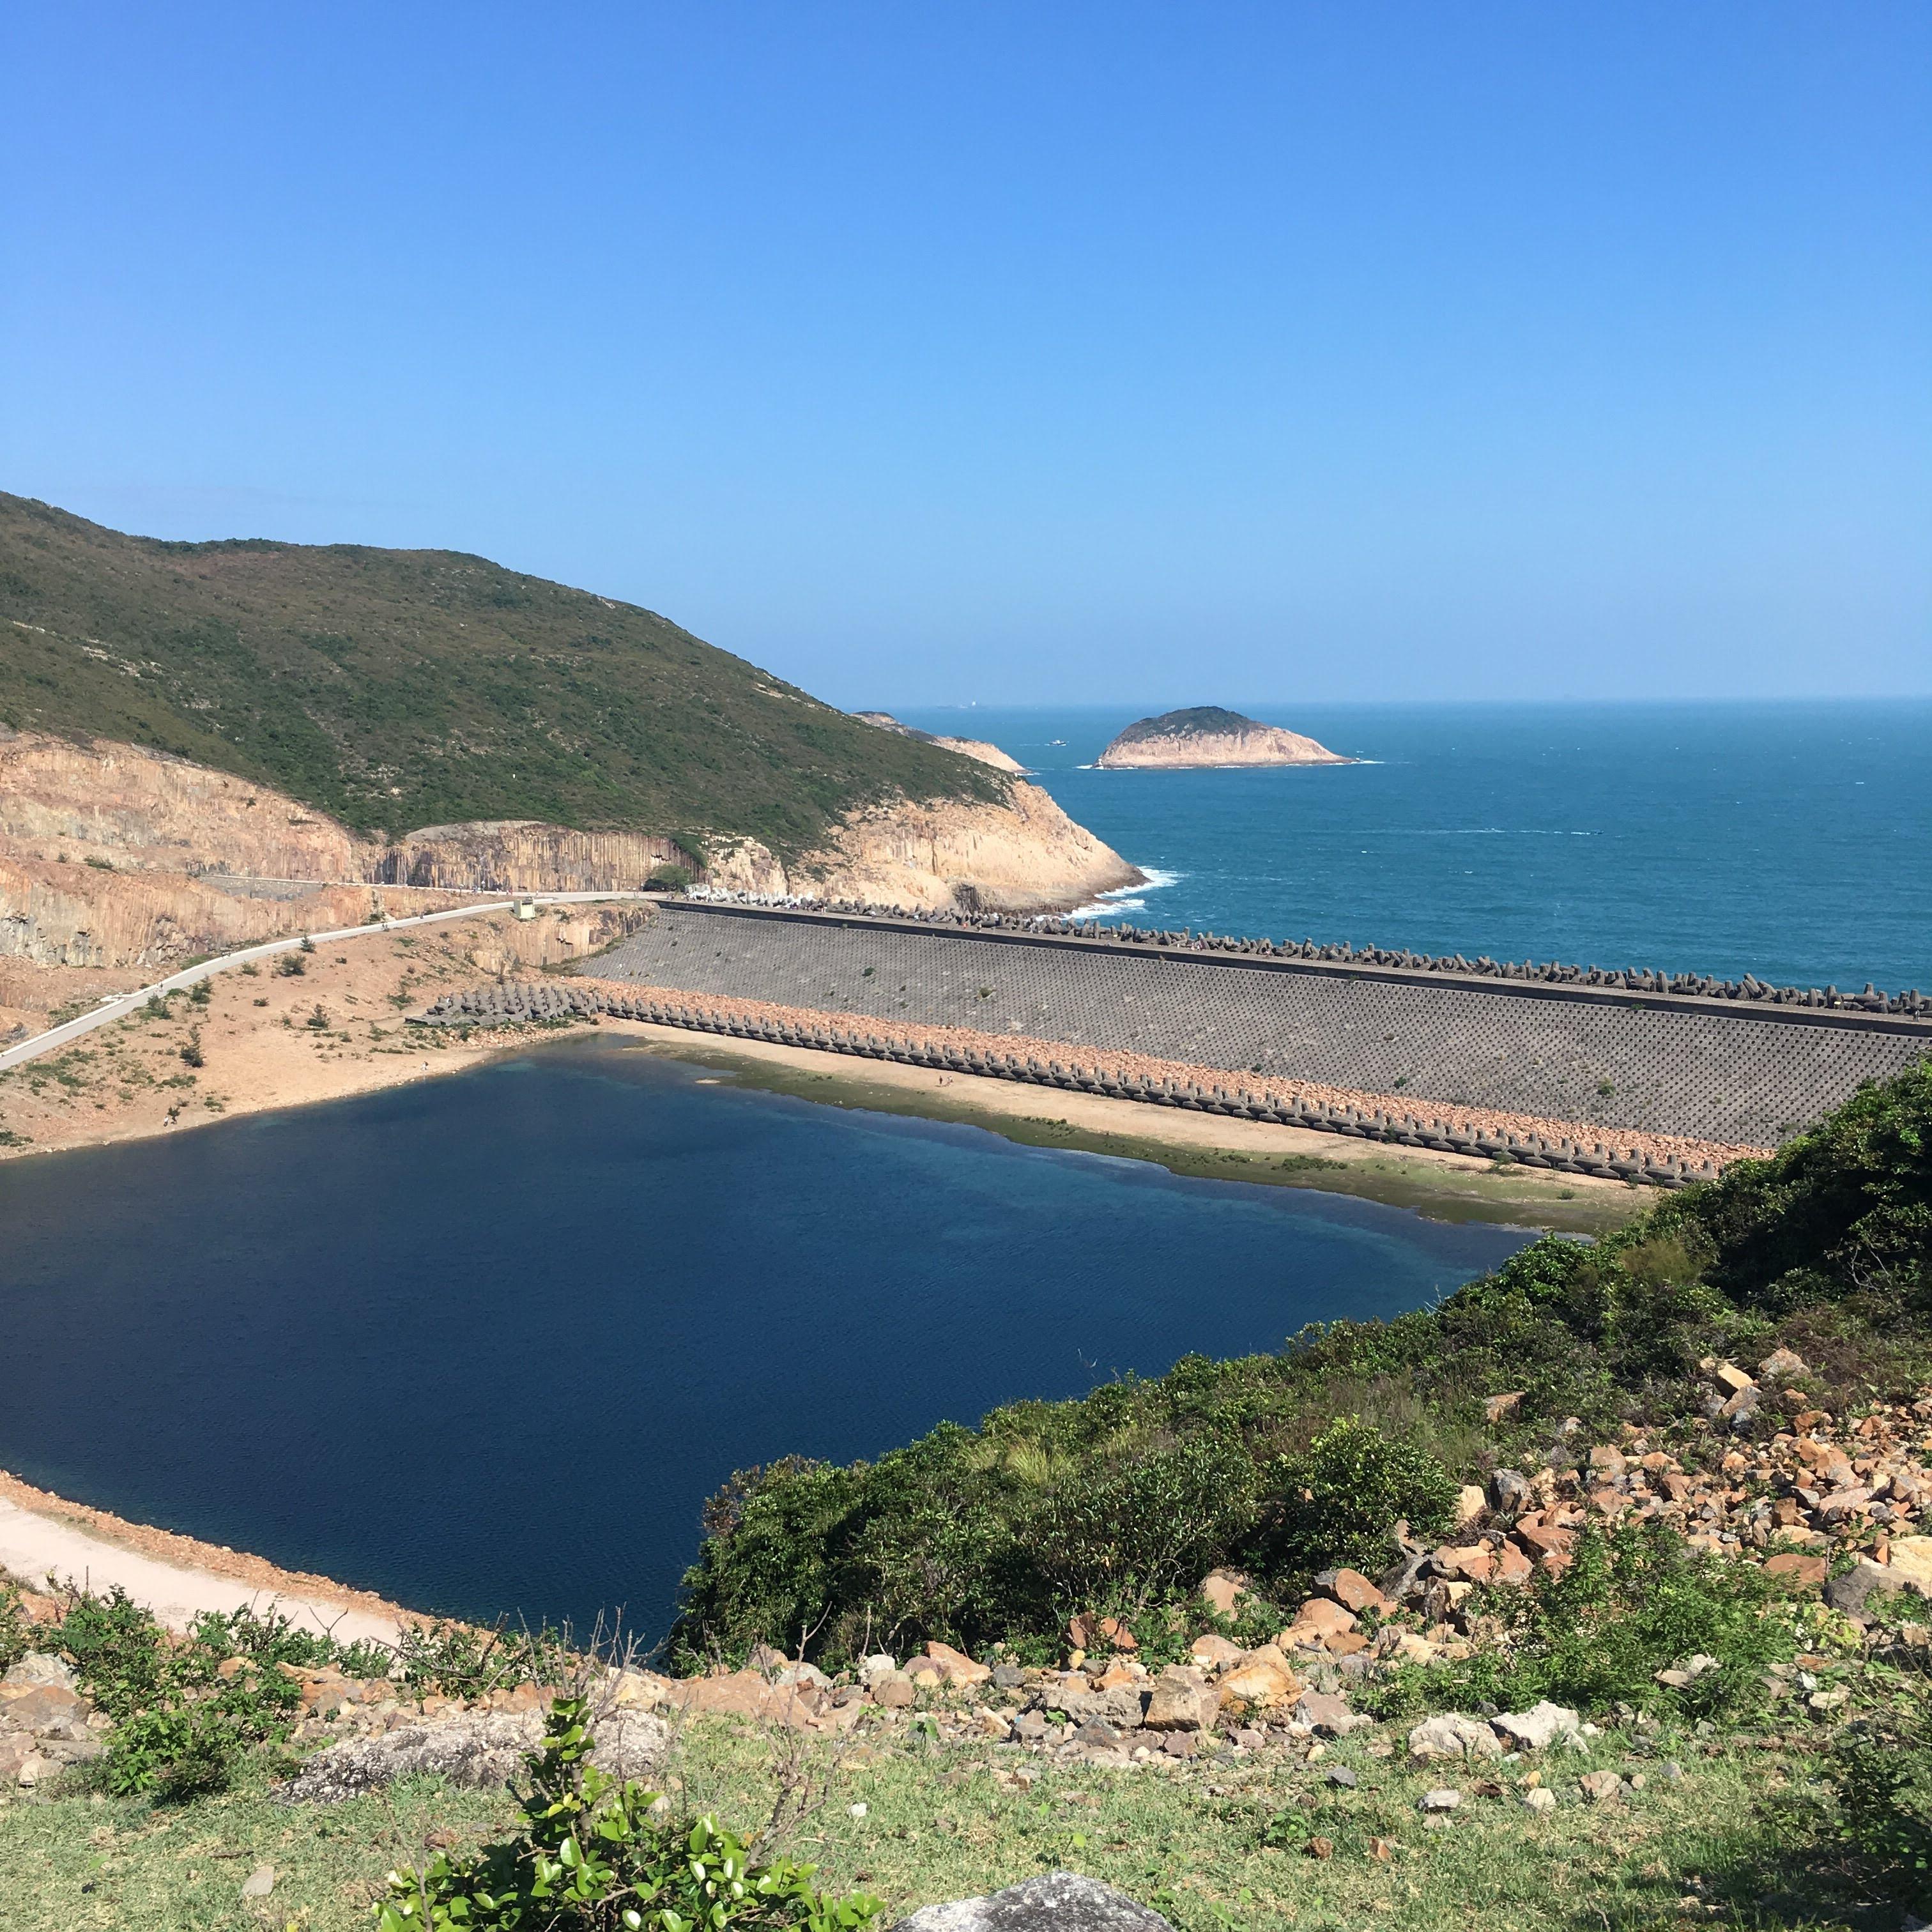 The Dam Things